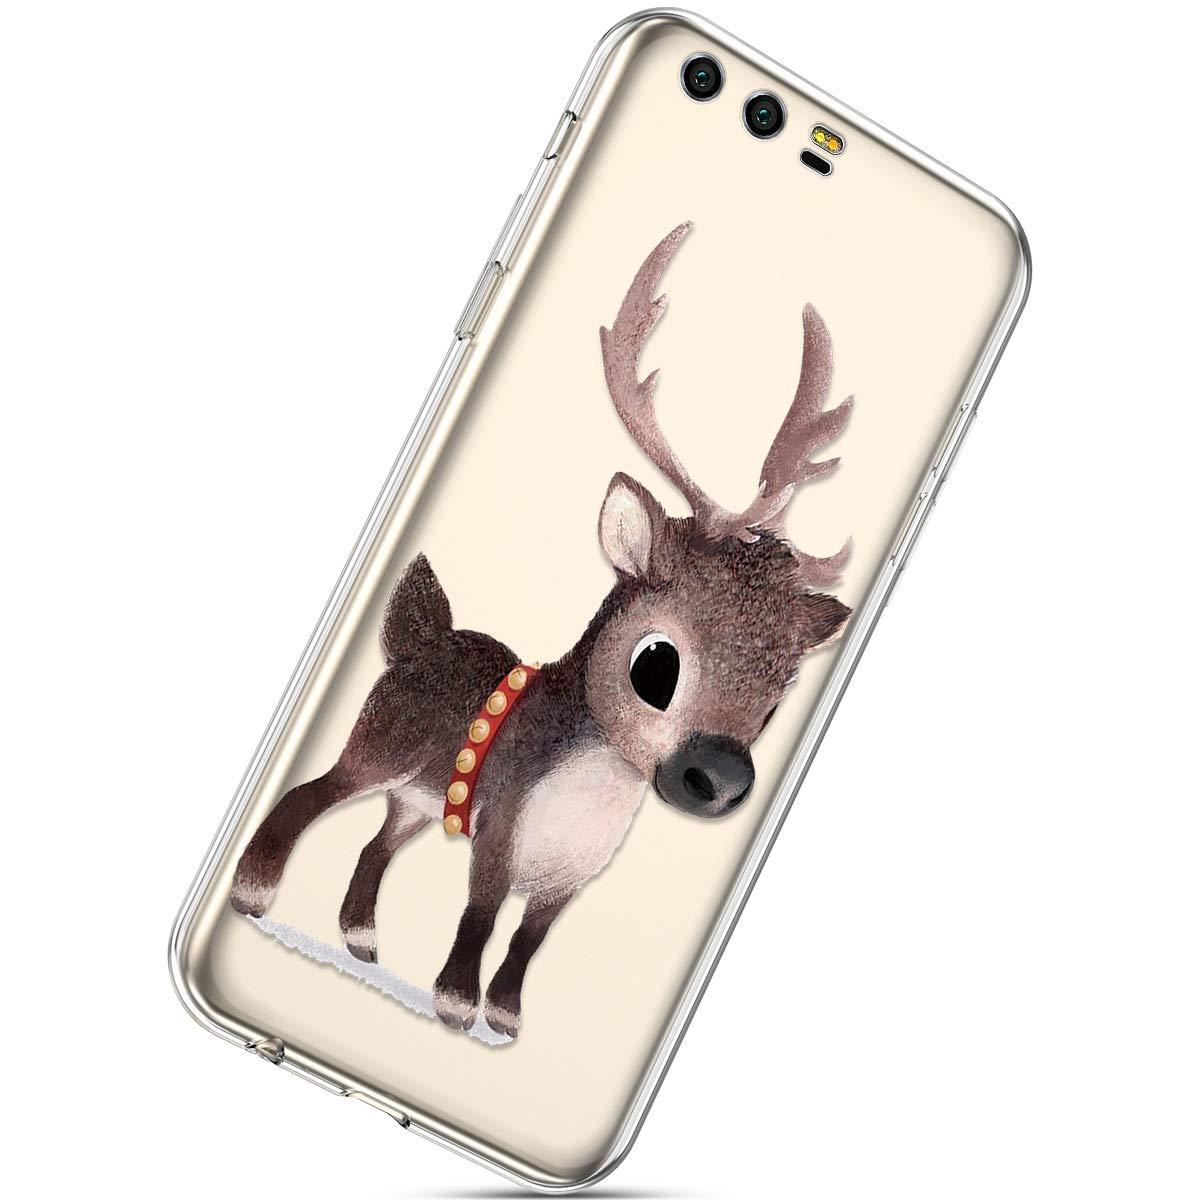 Handytasche Huawei Honor 9 Silikonh/ülle Cover Durchsichtige Handyh/ülle Silikon Kristall Klar Transparent Schutzh/ülle Crystal Clear Handycover D/ünn Bumper Case Schutz Tasche,Schneeflocke Hirsch